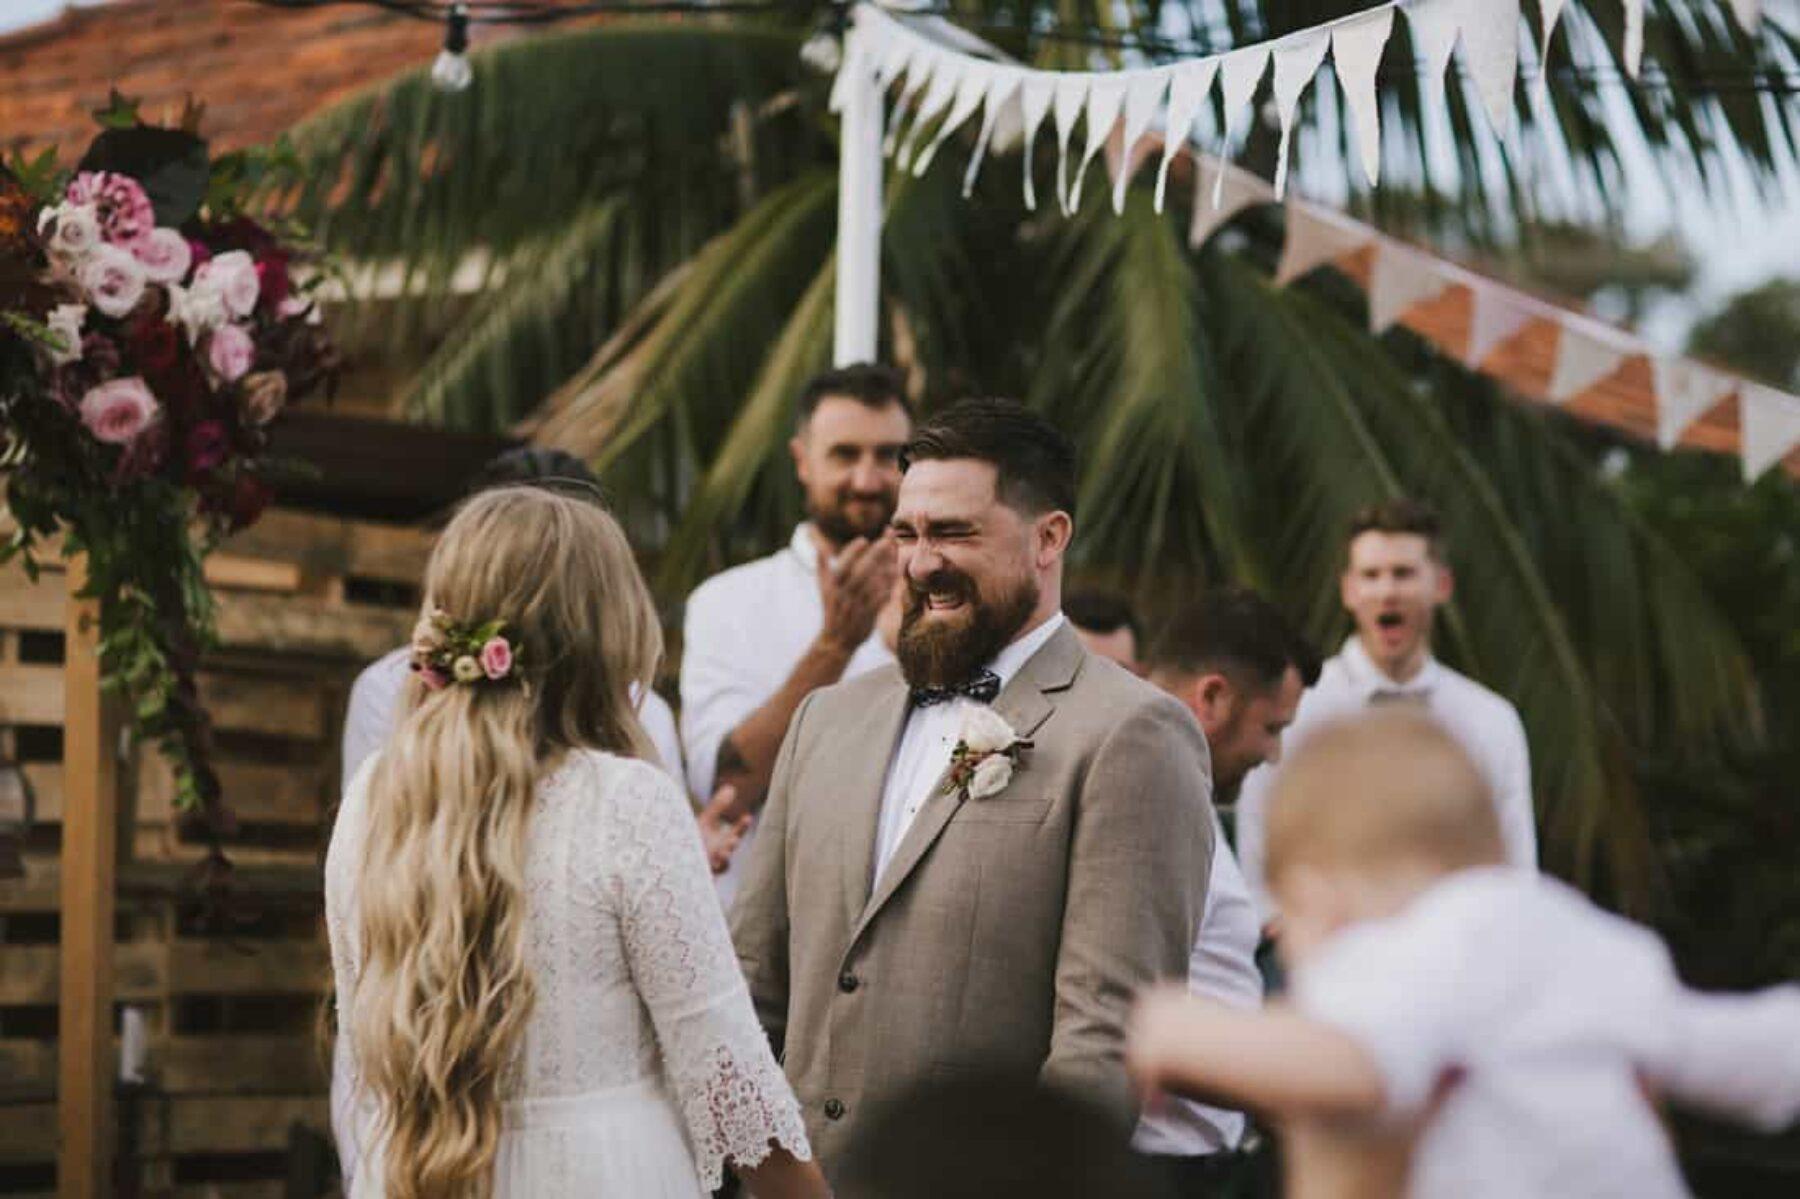 DIY backyard wedding with a vintage-bohemian vibe